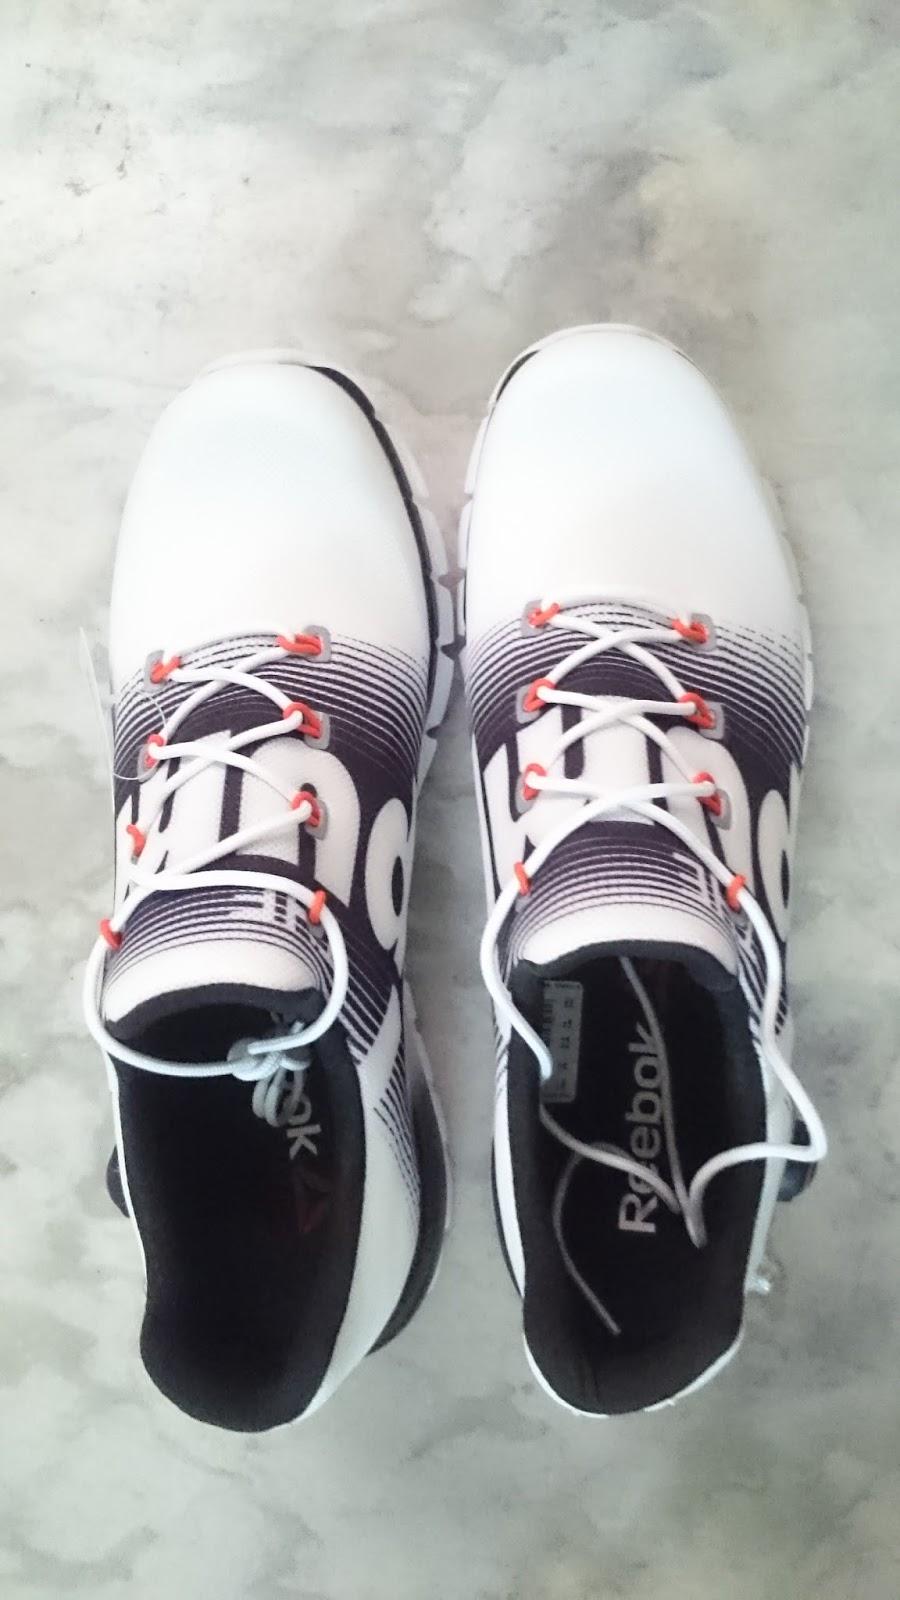 Familiar litro Sastre  Journal Excentrique: Review: Reebok ZPump Fusion Running Shoes